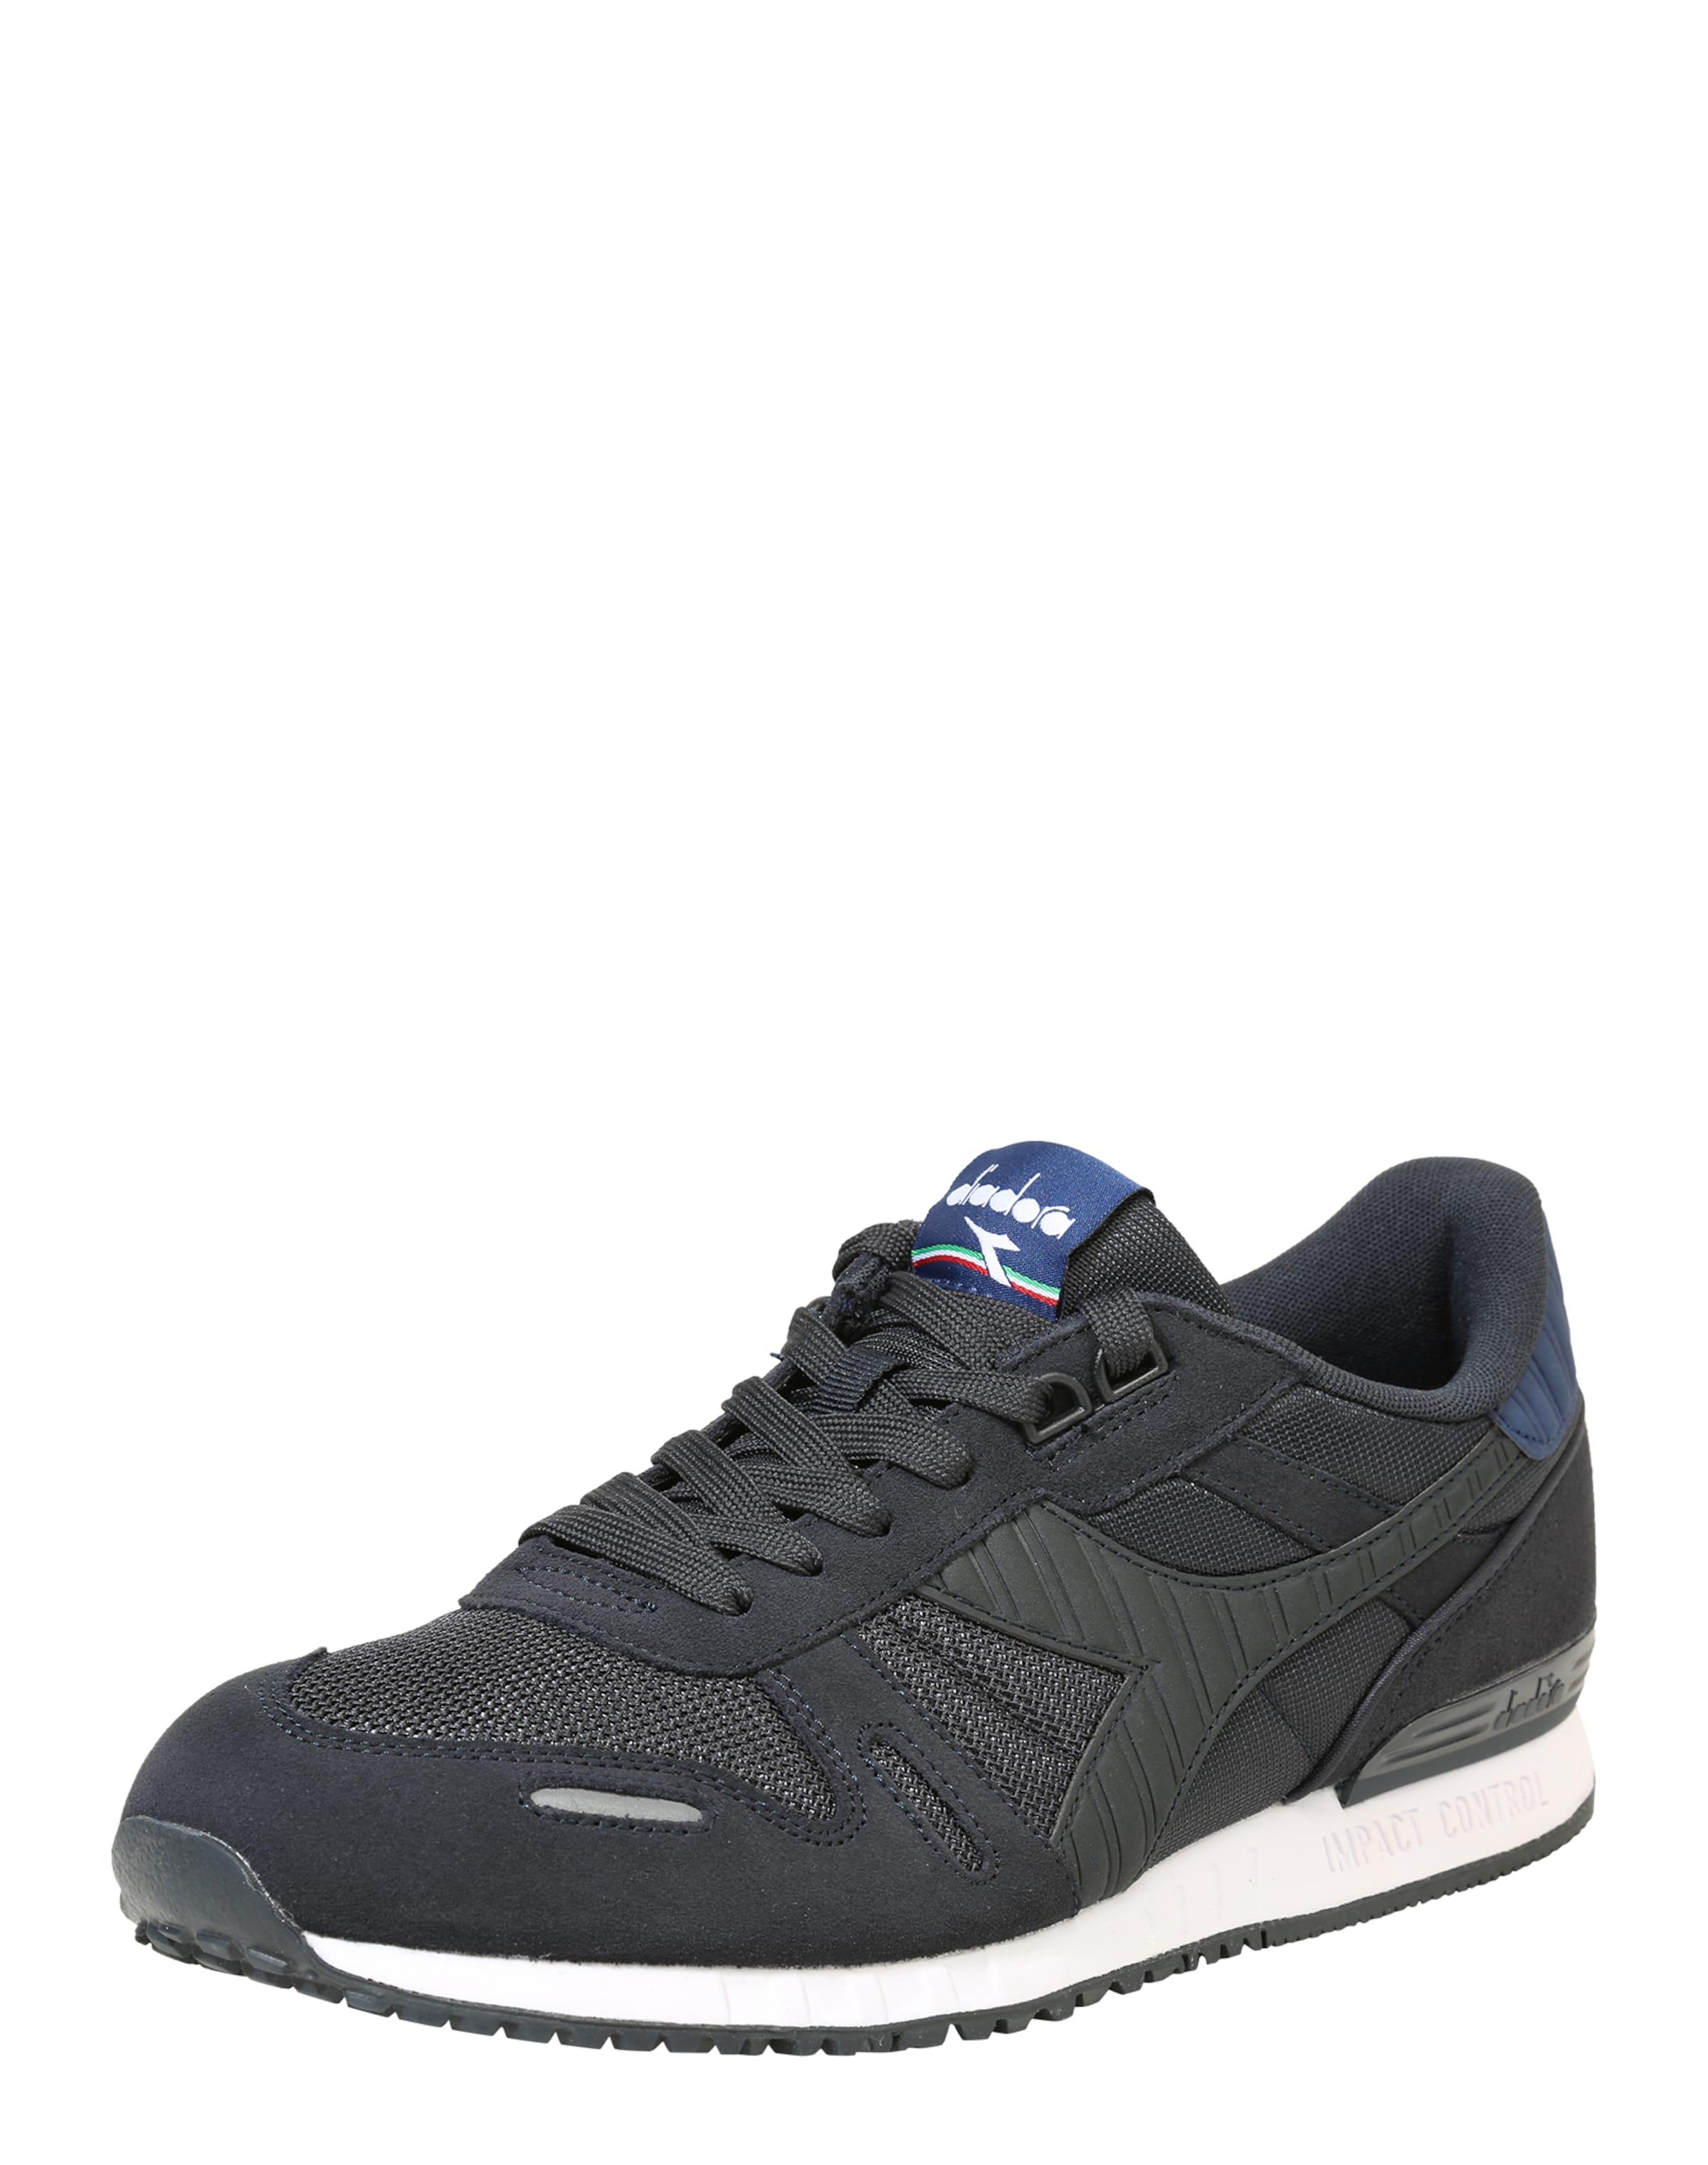 Diadora Sneaker Titan Verschleißfeste billige Schuhe